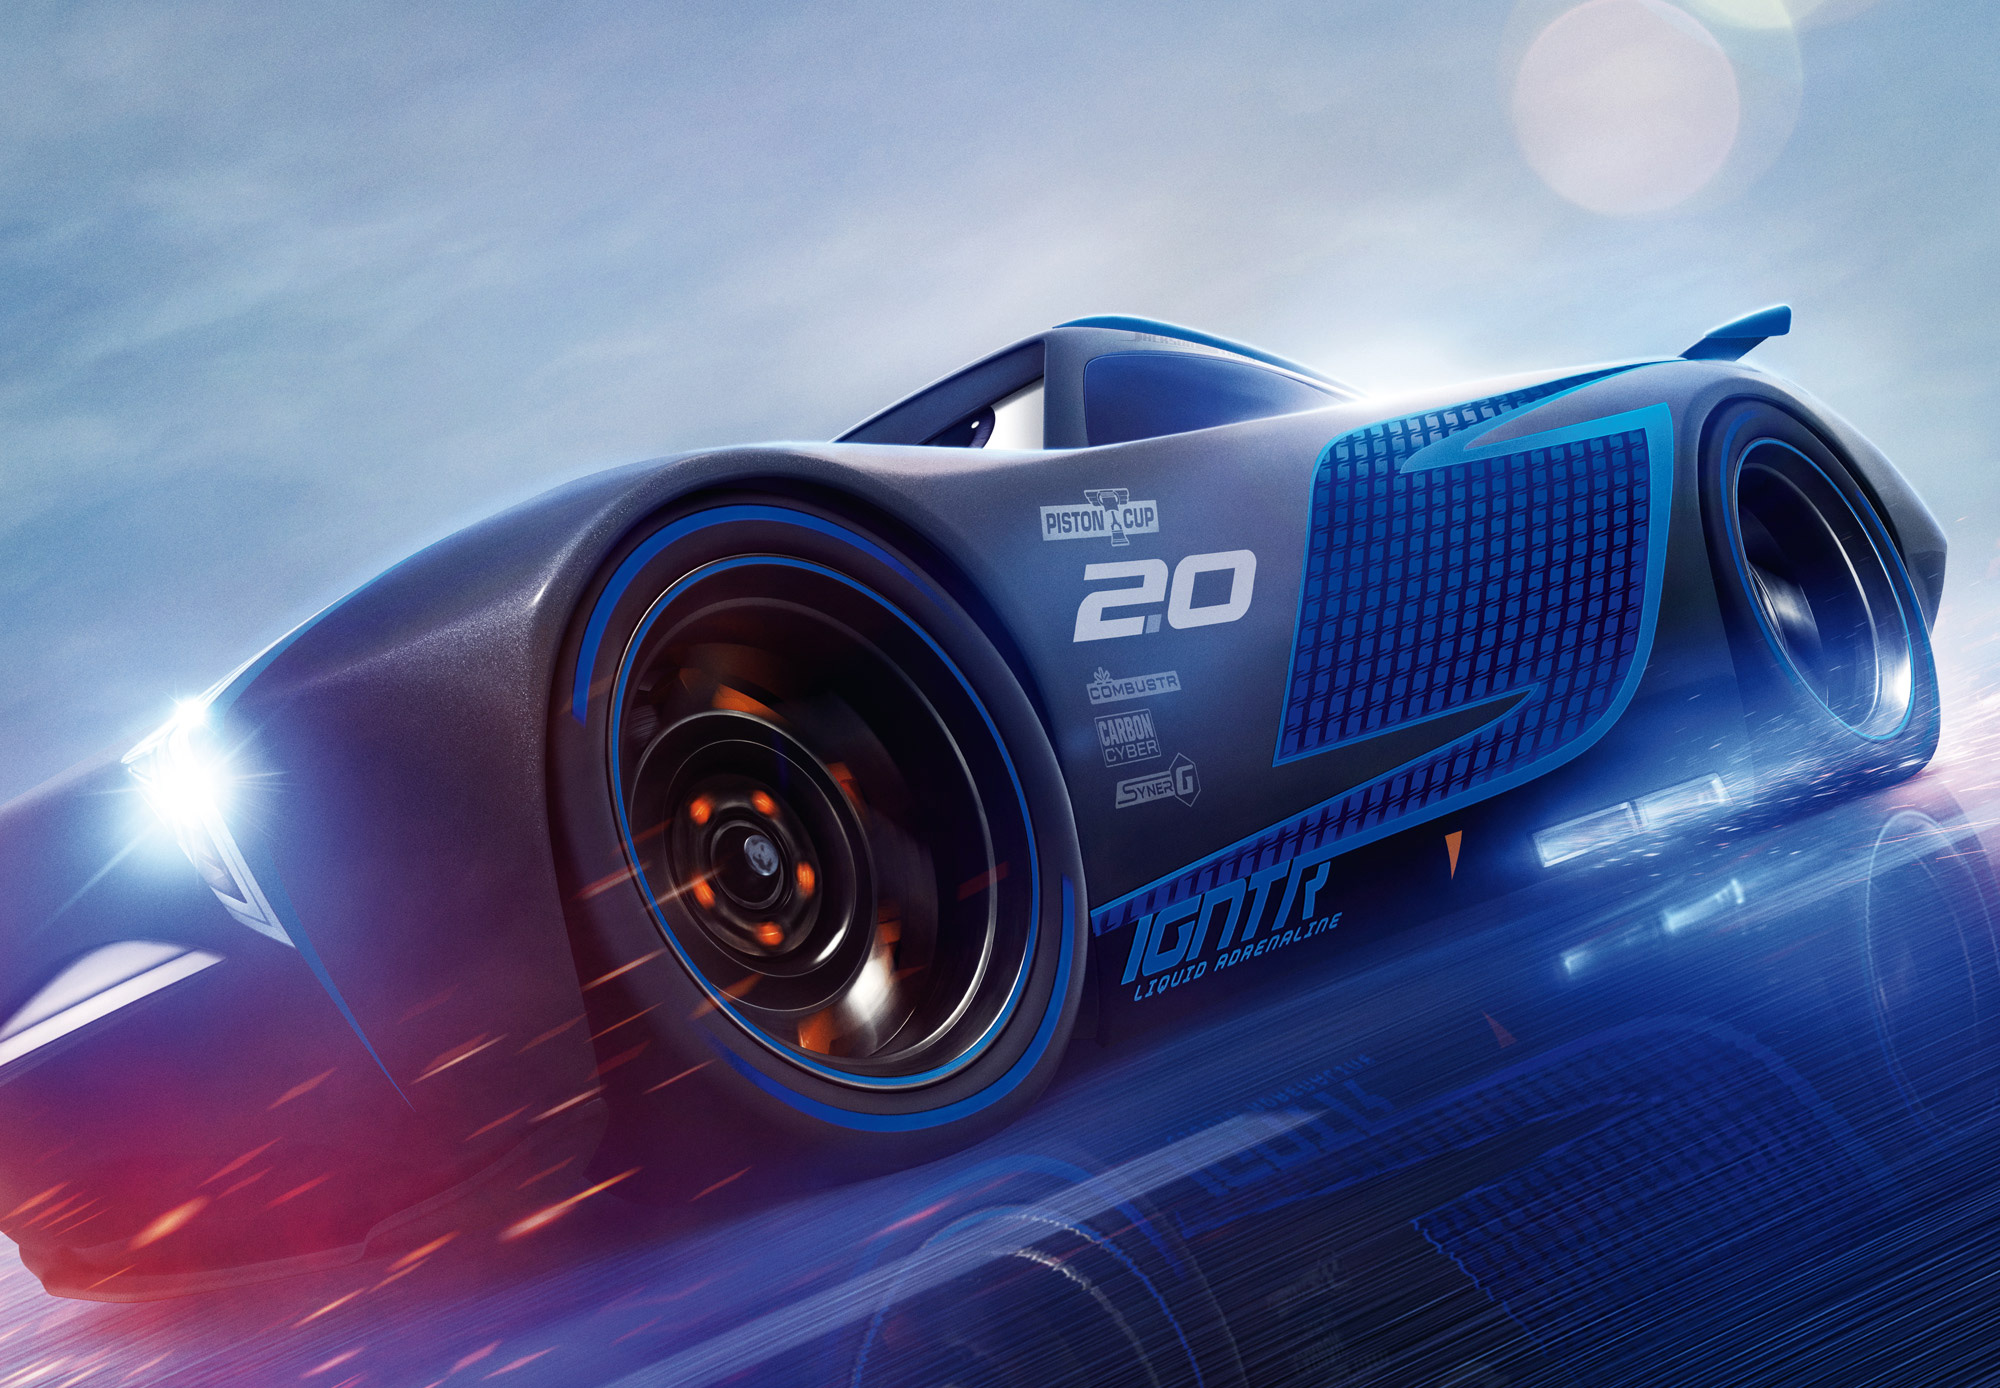 Pixar Cars Desktop Wallpaper Cars 3 Jackson Storm Hd Hd Movies 4k Wallpapers Images